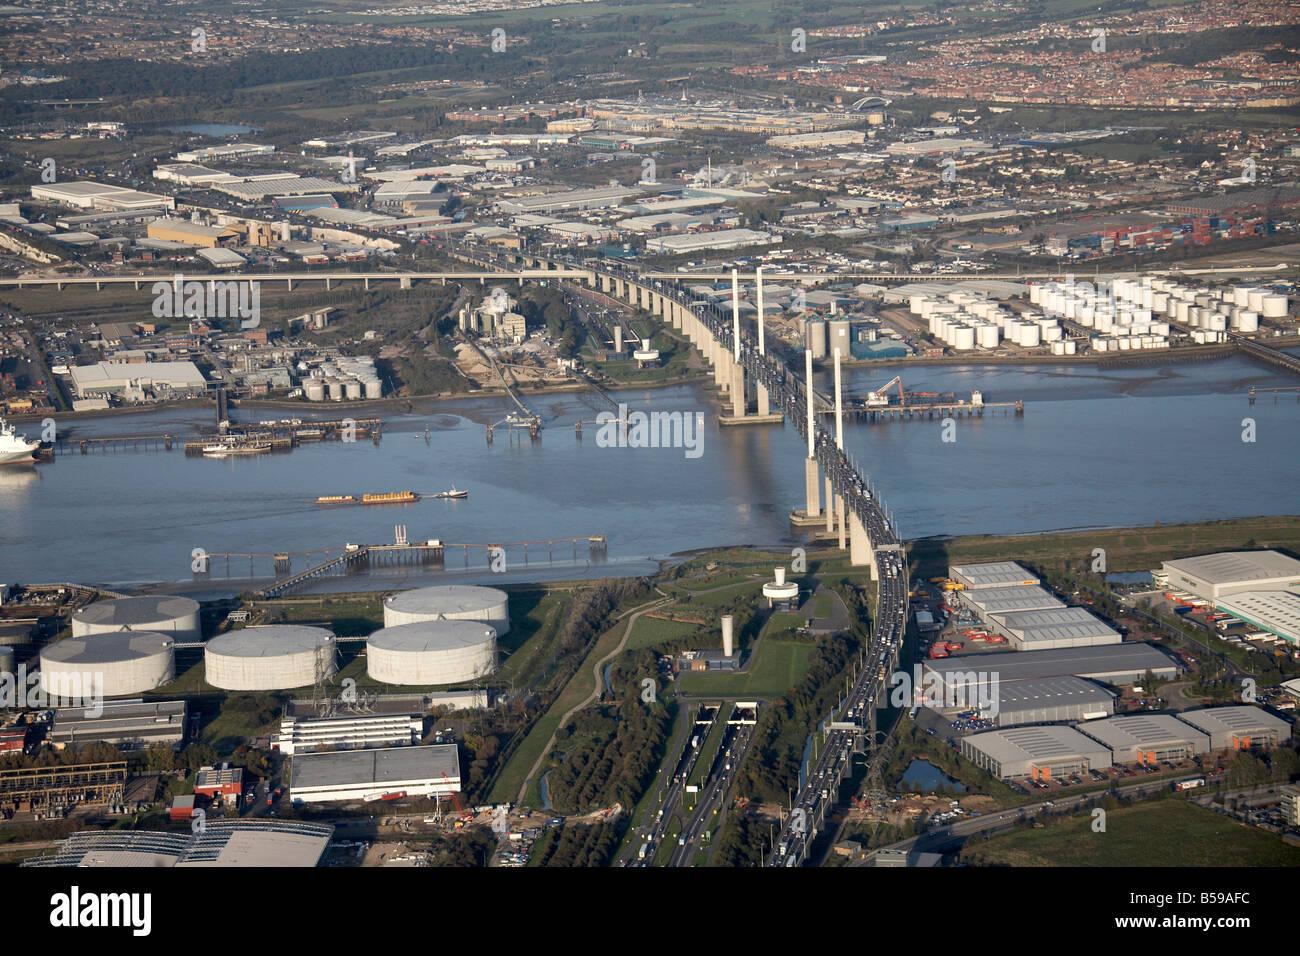 Aerial view north east of gas works Queen Elizabeth II Bridge warehouses River Thames Purfleet Deep Wharf London - Stock Image